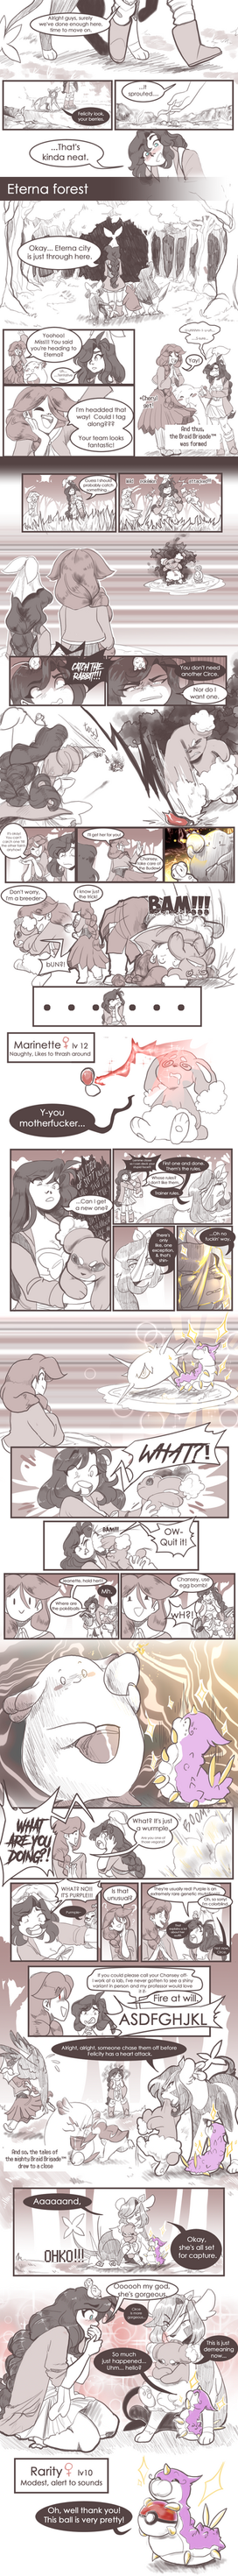 Lissylocke page 25 by Skitea